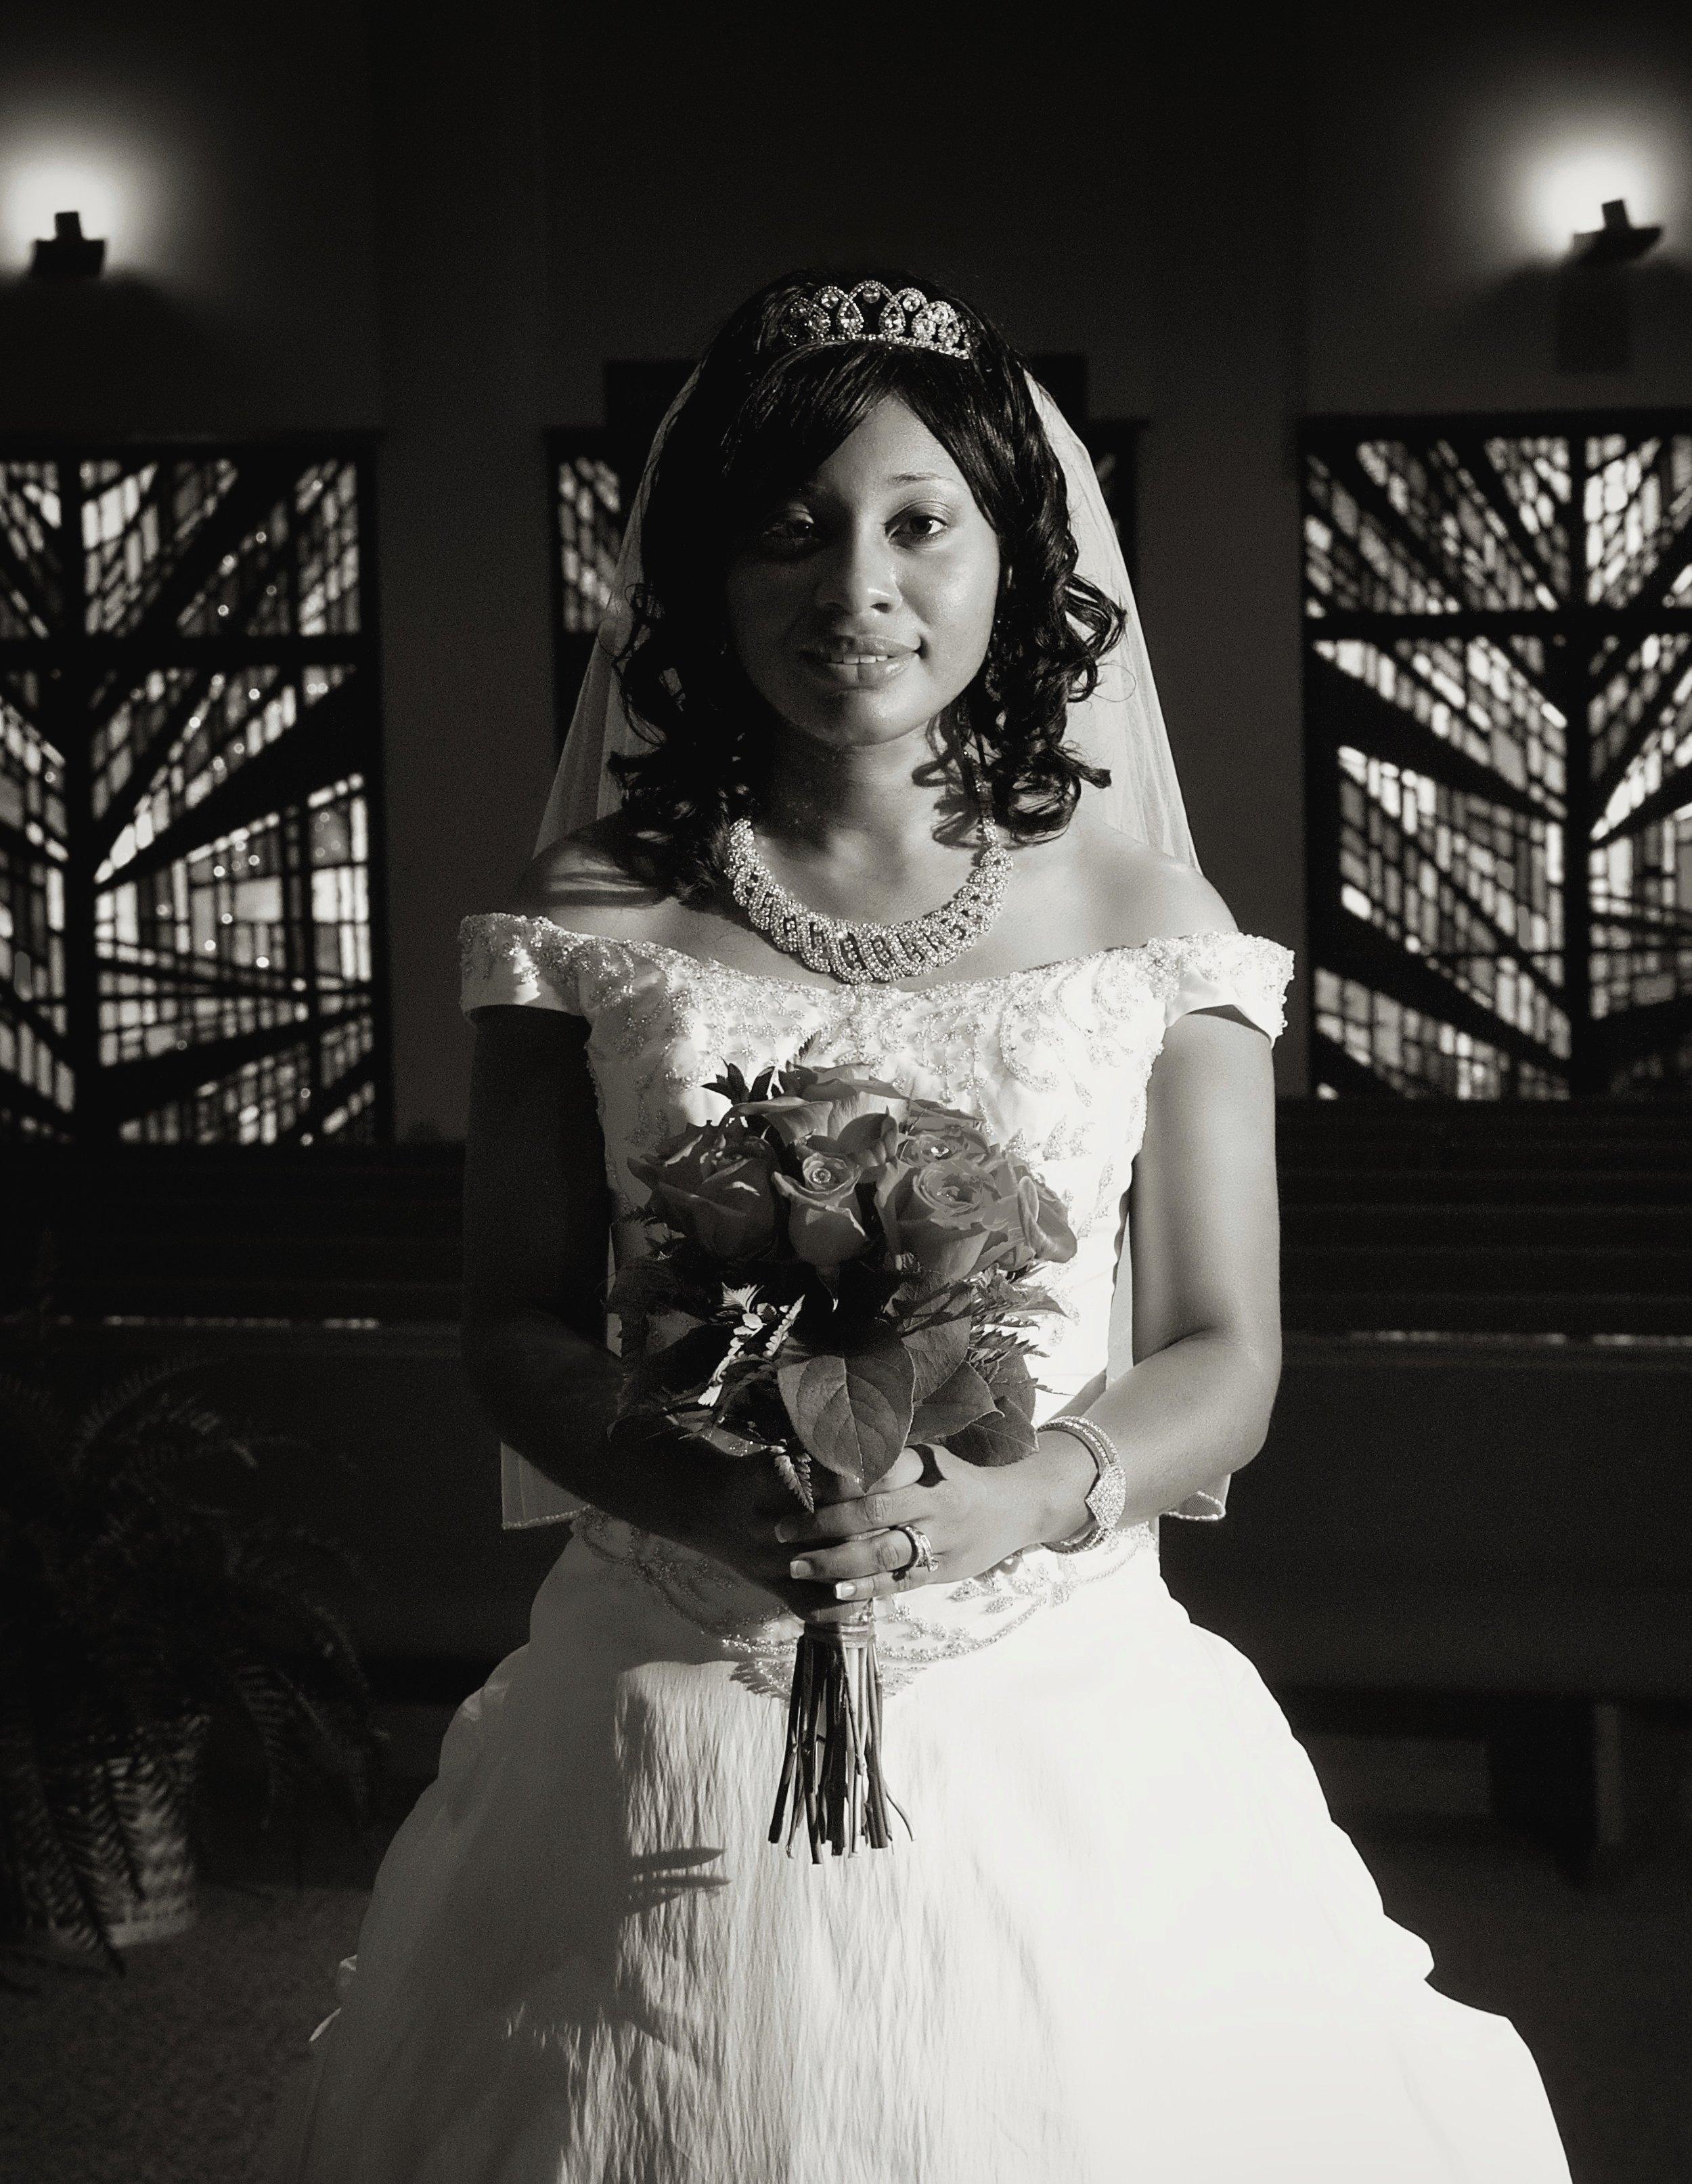 kiera-ricardo-3-19-2011-wedding-19199.jpg